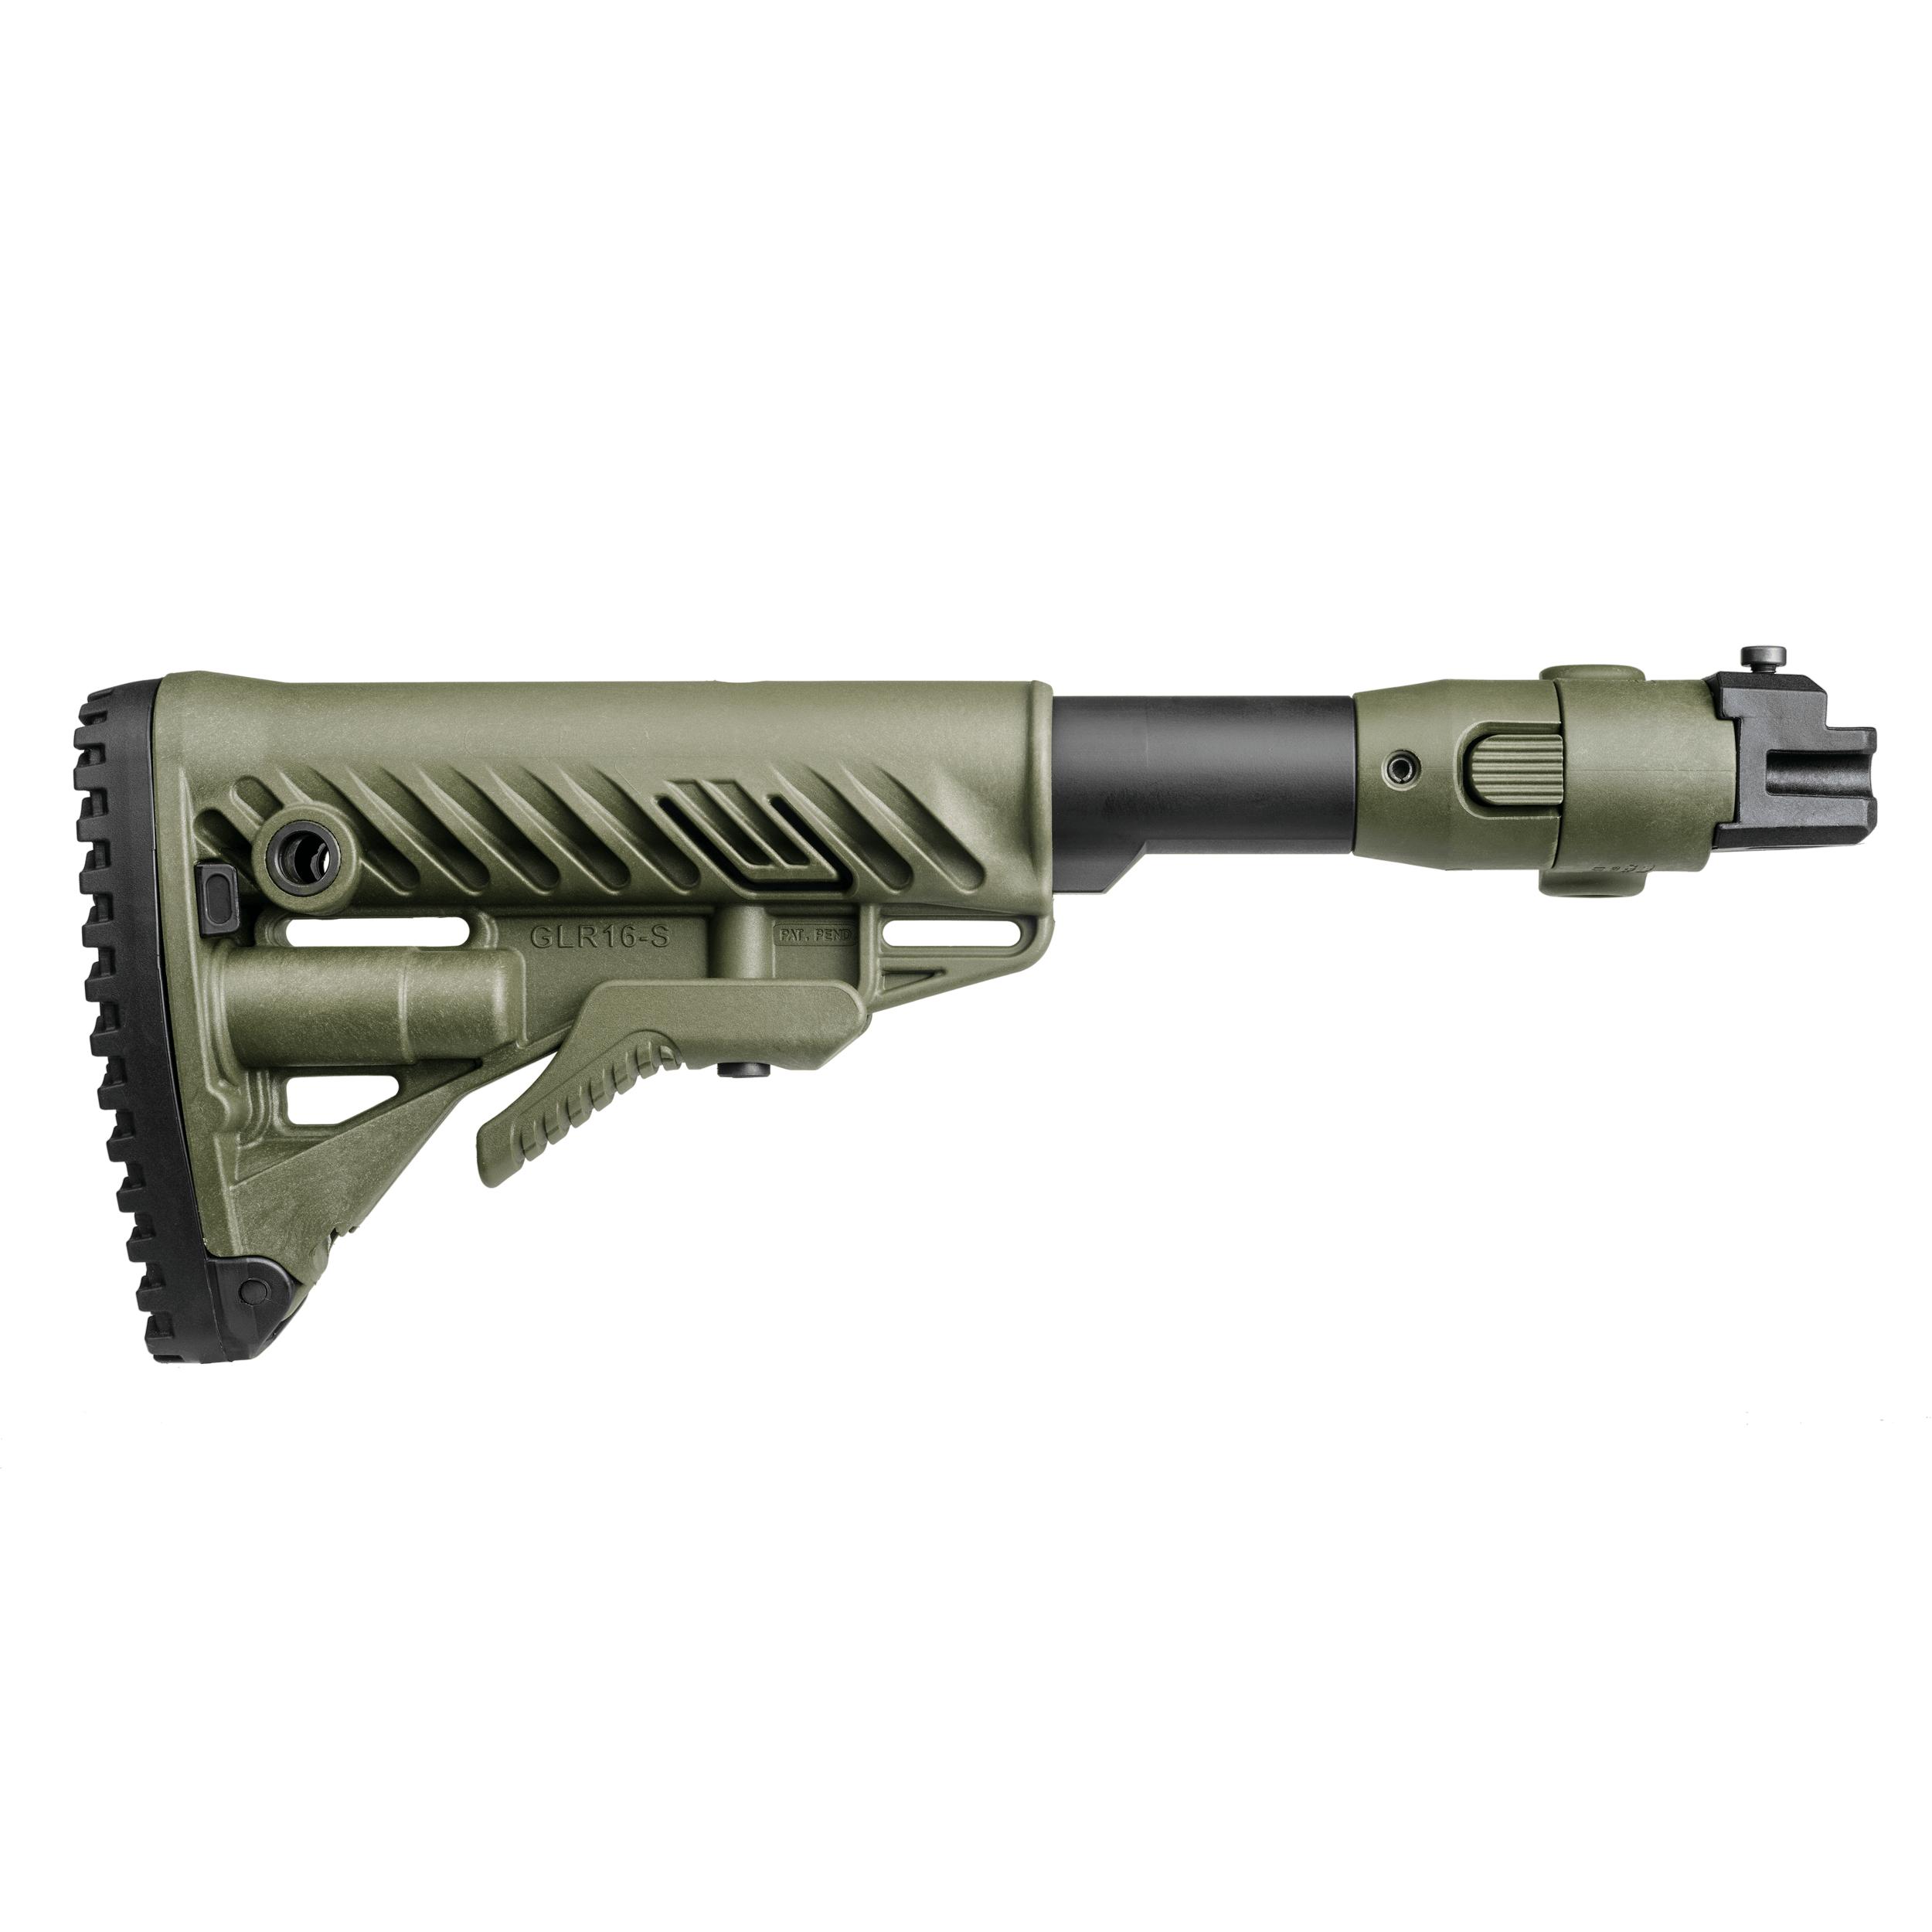 AK47 folding buttstock (Polymer Joint)